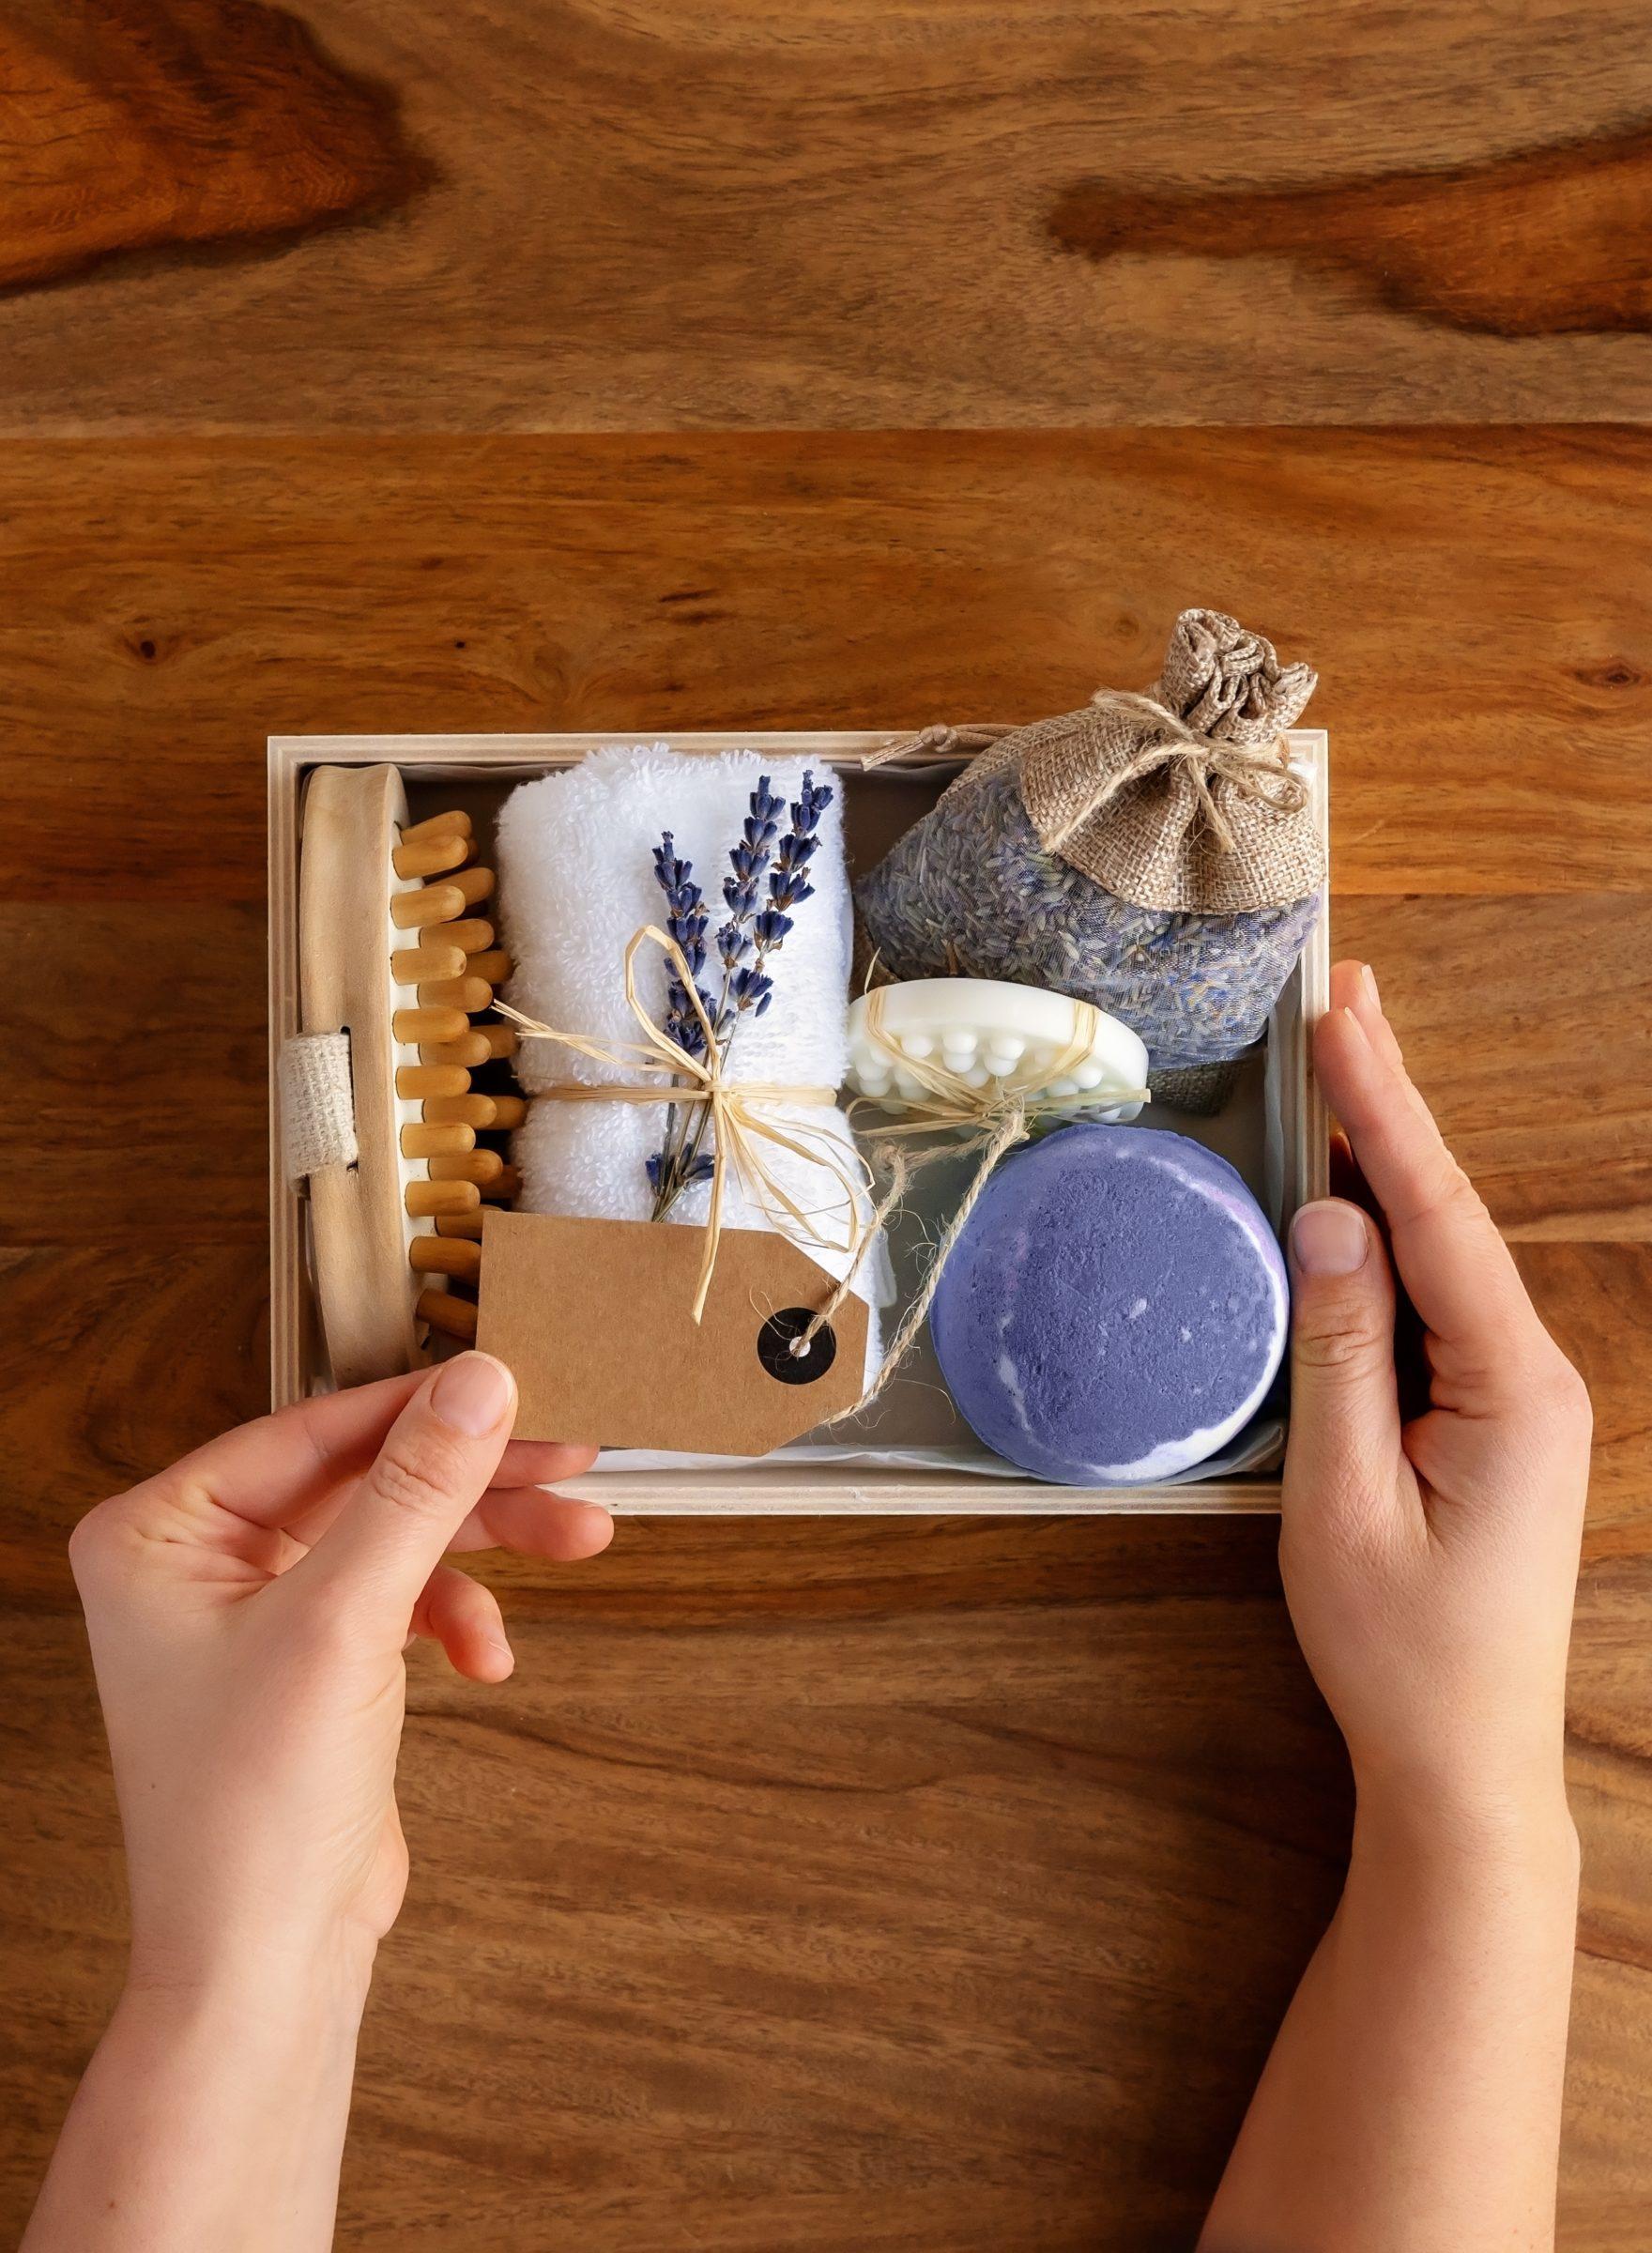 preparing homemade gift box or self care package w JFQEJGM